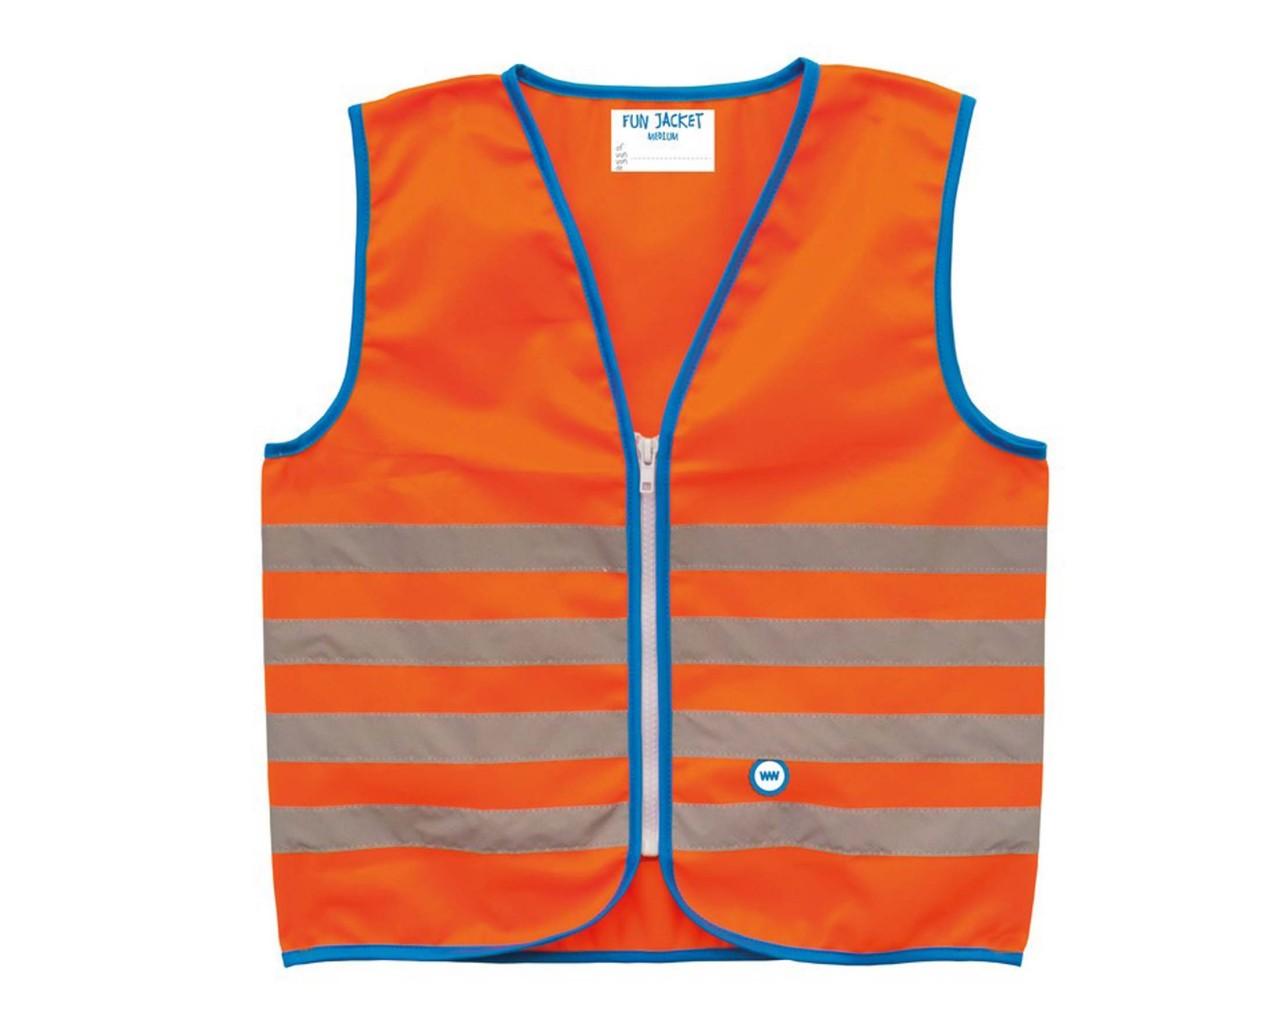 Wowow Fun Jacket - signal vest for Kids   orange-reflect